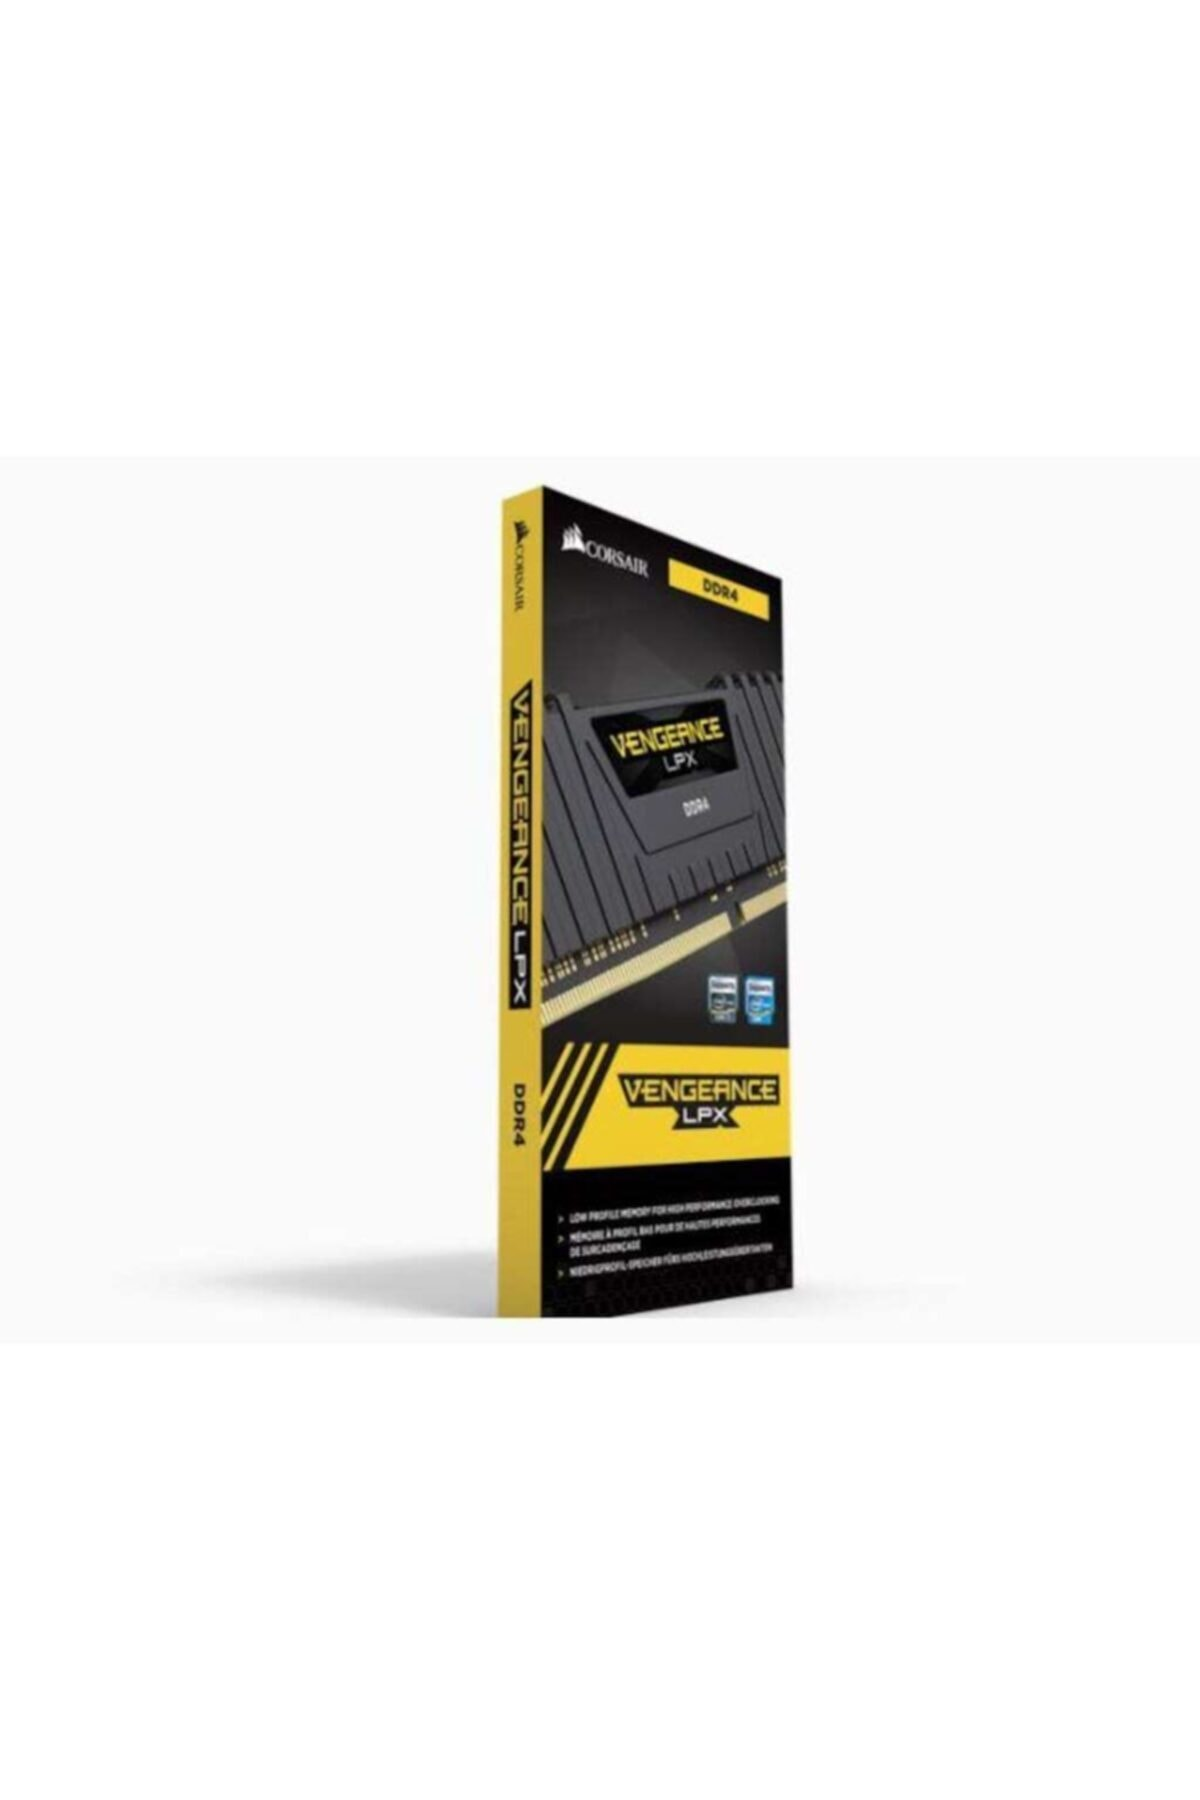 Corsair Vengeance LPX 16GB 3000MHz DDR4 Ram CMK16GX4M1D3000C16 1